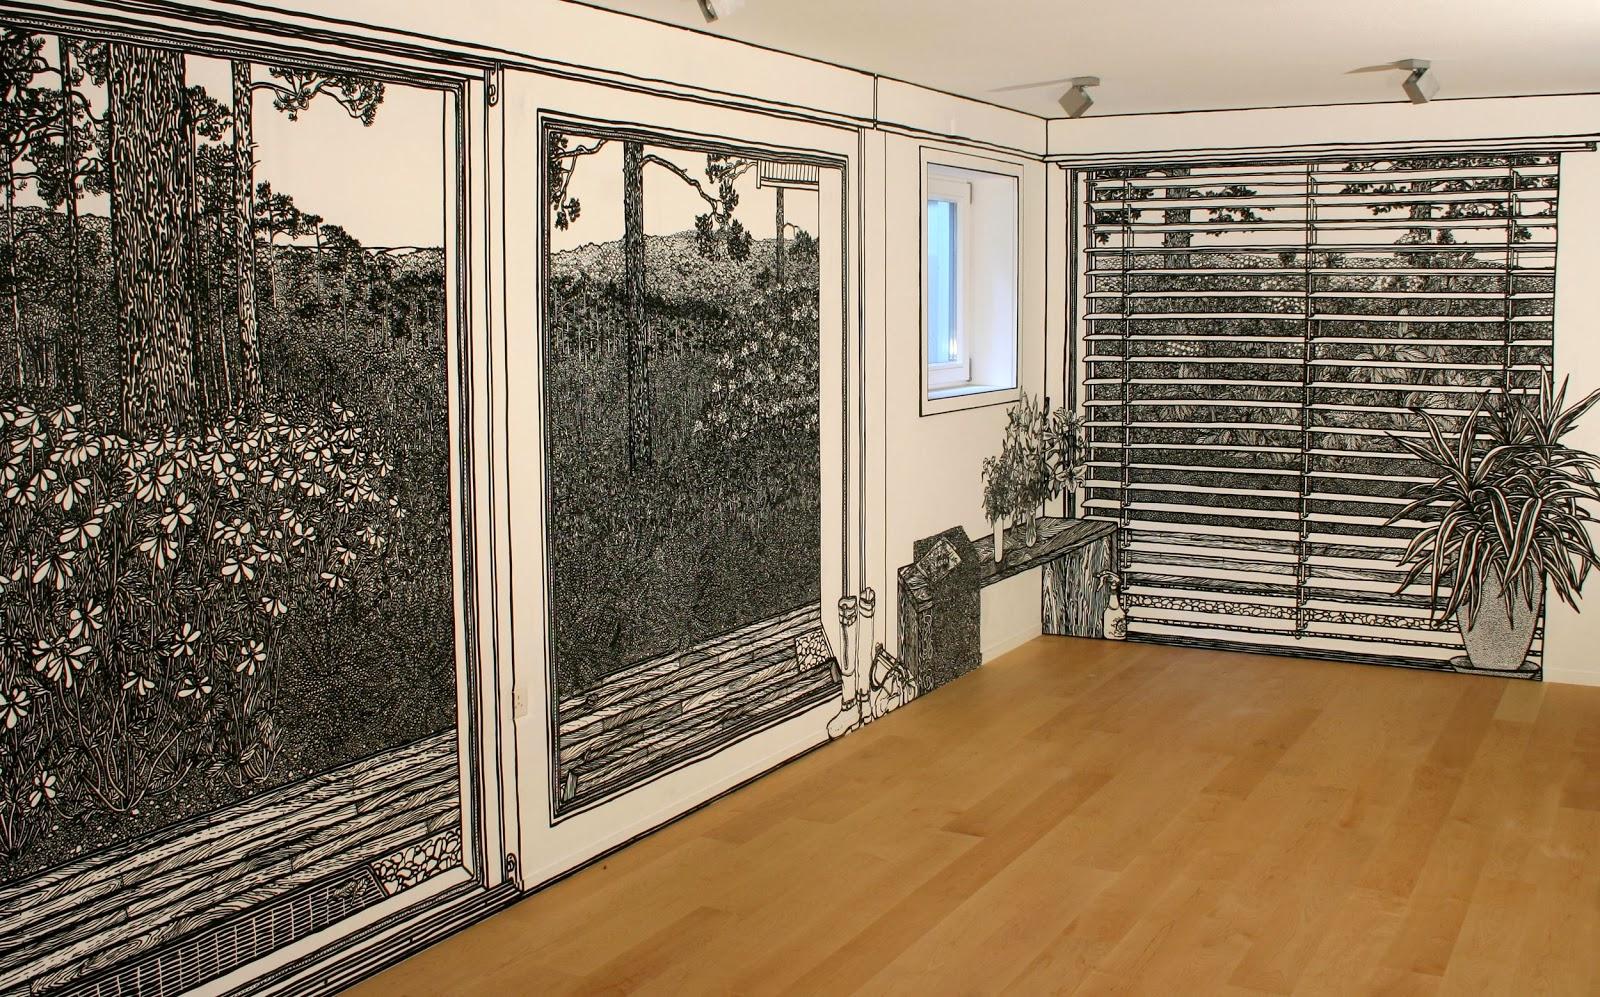 06-Artist-Charlotte-Mann-Draw-on-Walls-www-designstack-co